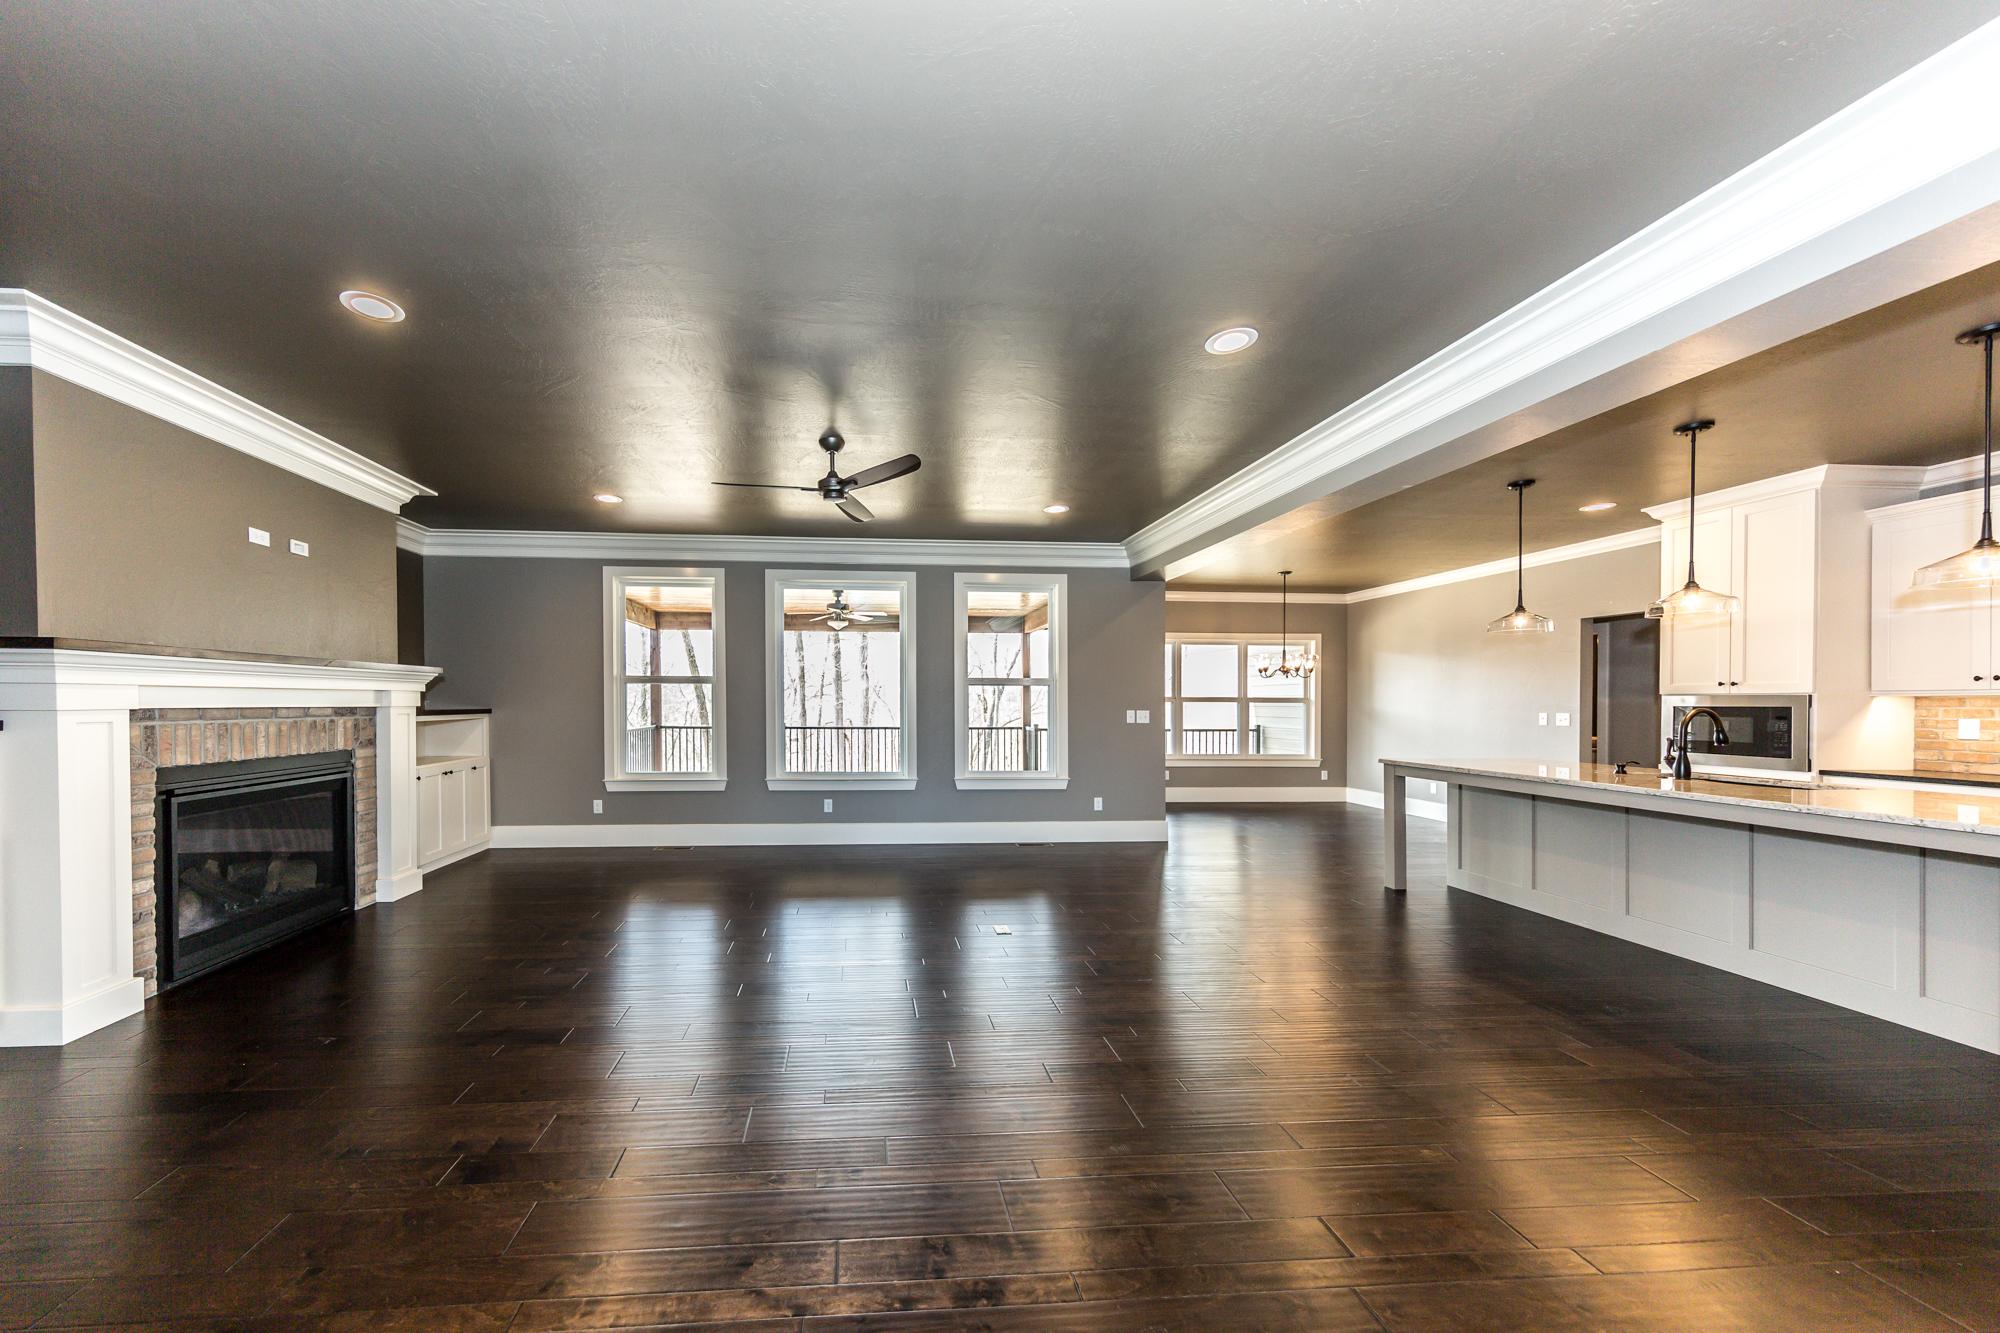 New-Construction-For-Sale-Bethel-Ridge-Farms-Scott-AFB-Illinois-4.jpg